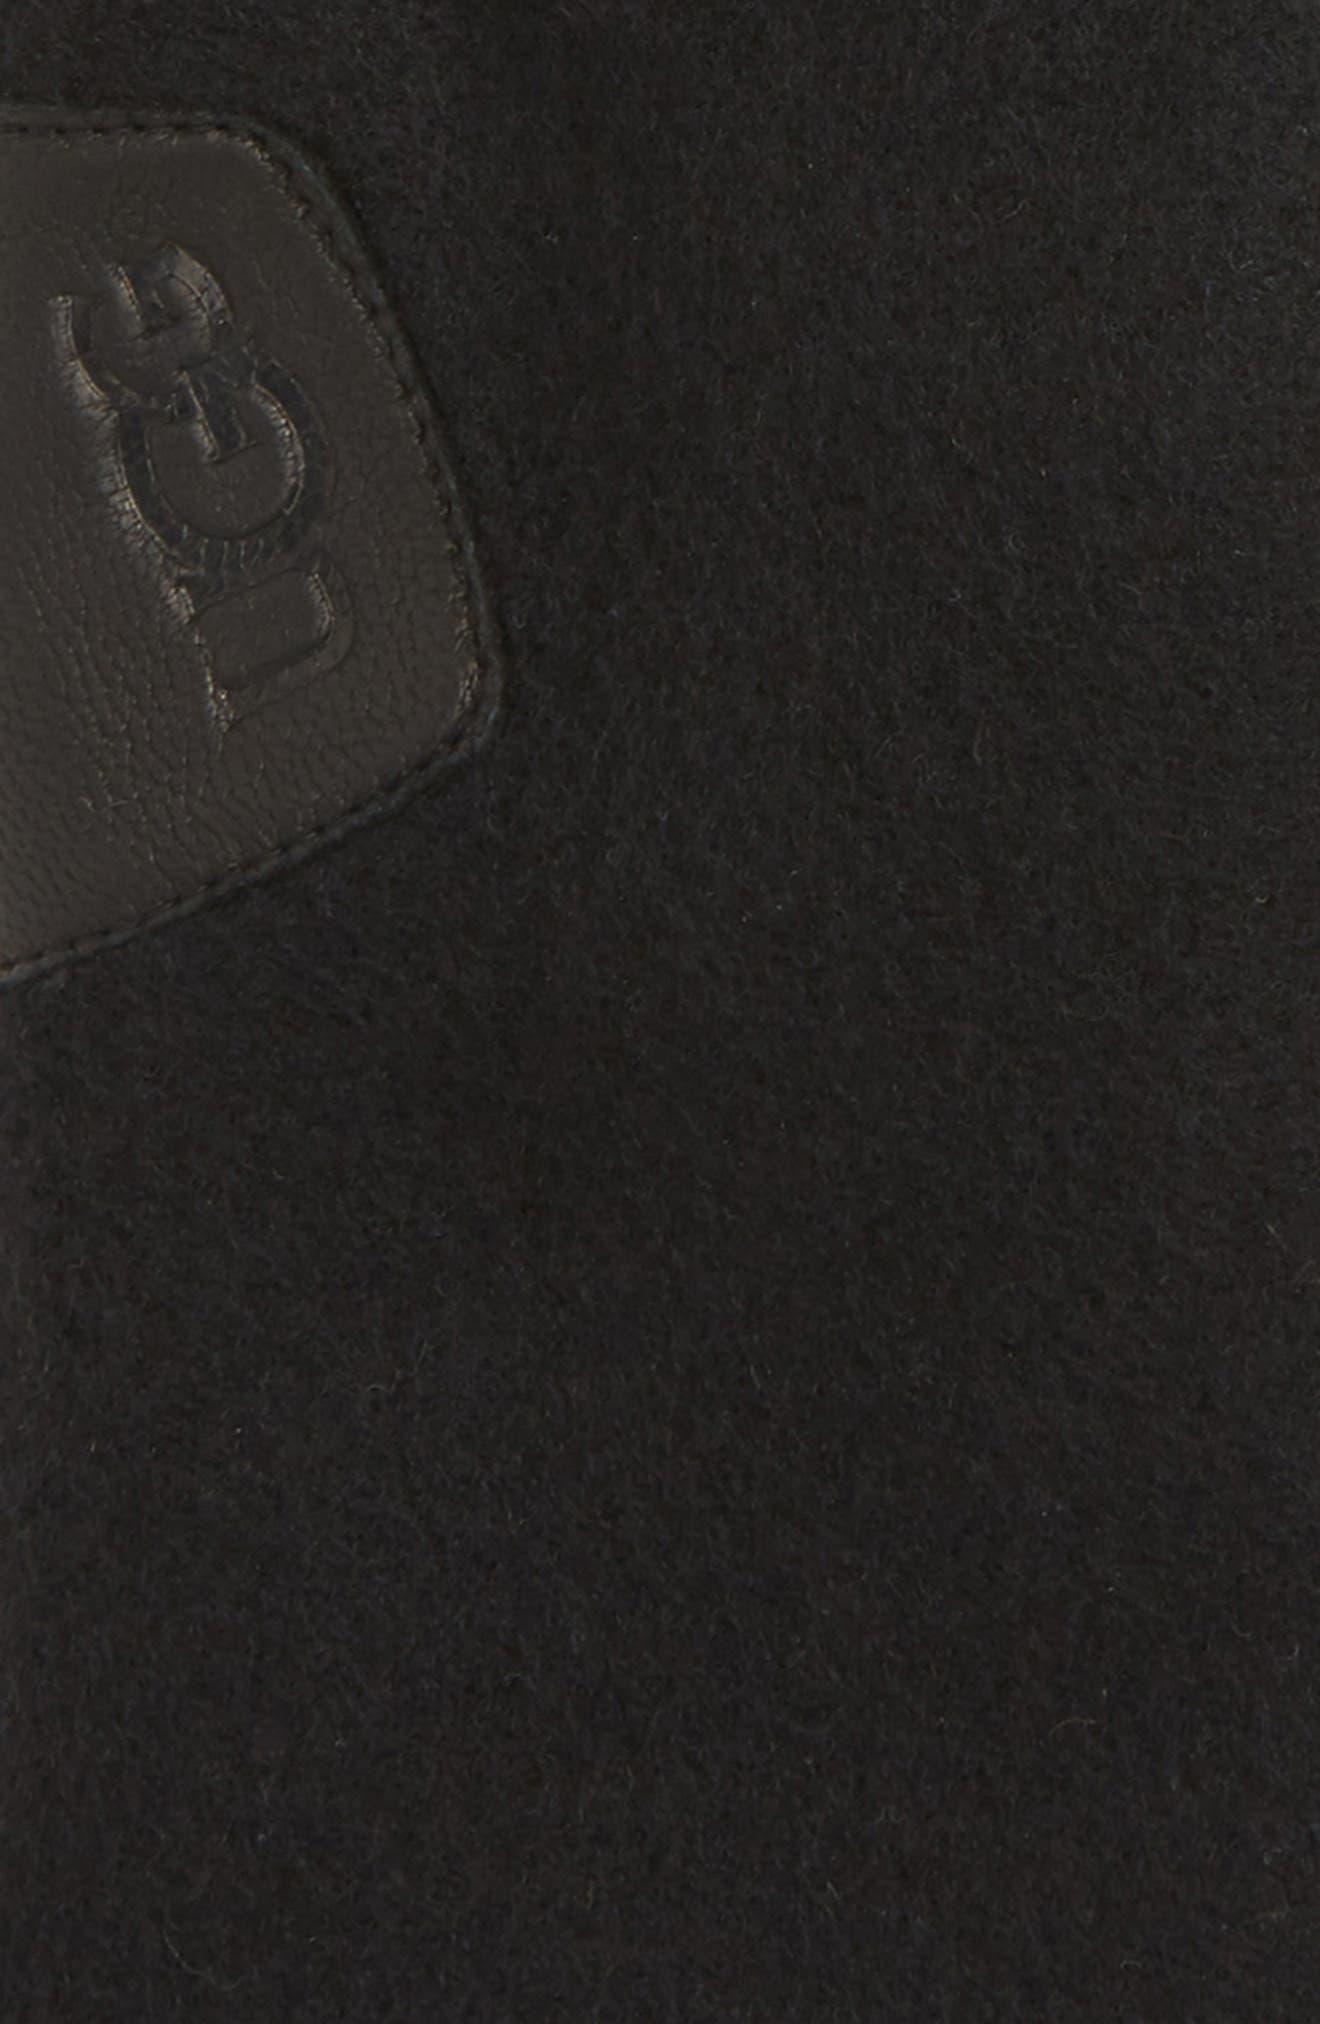 Leather Palm Knit Gloves,                             Alternate thumbnail 3, color,                             BLACK